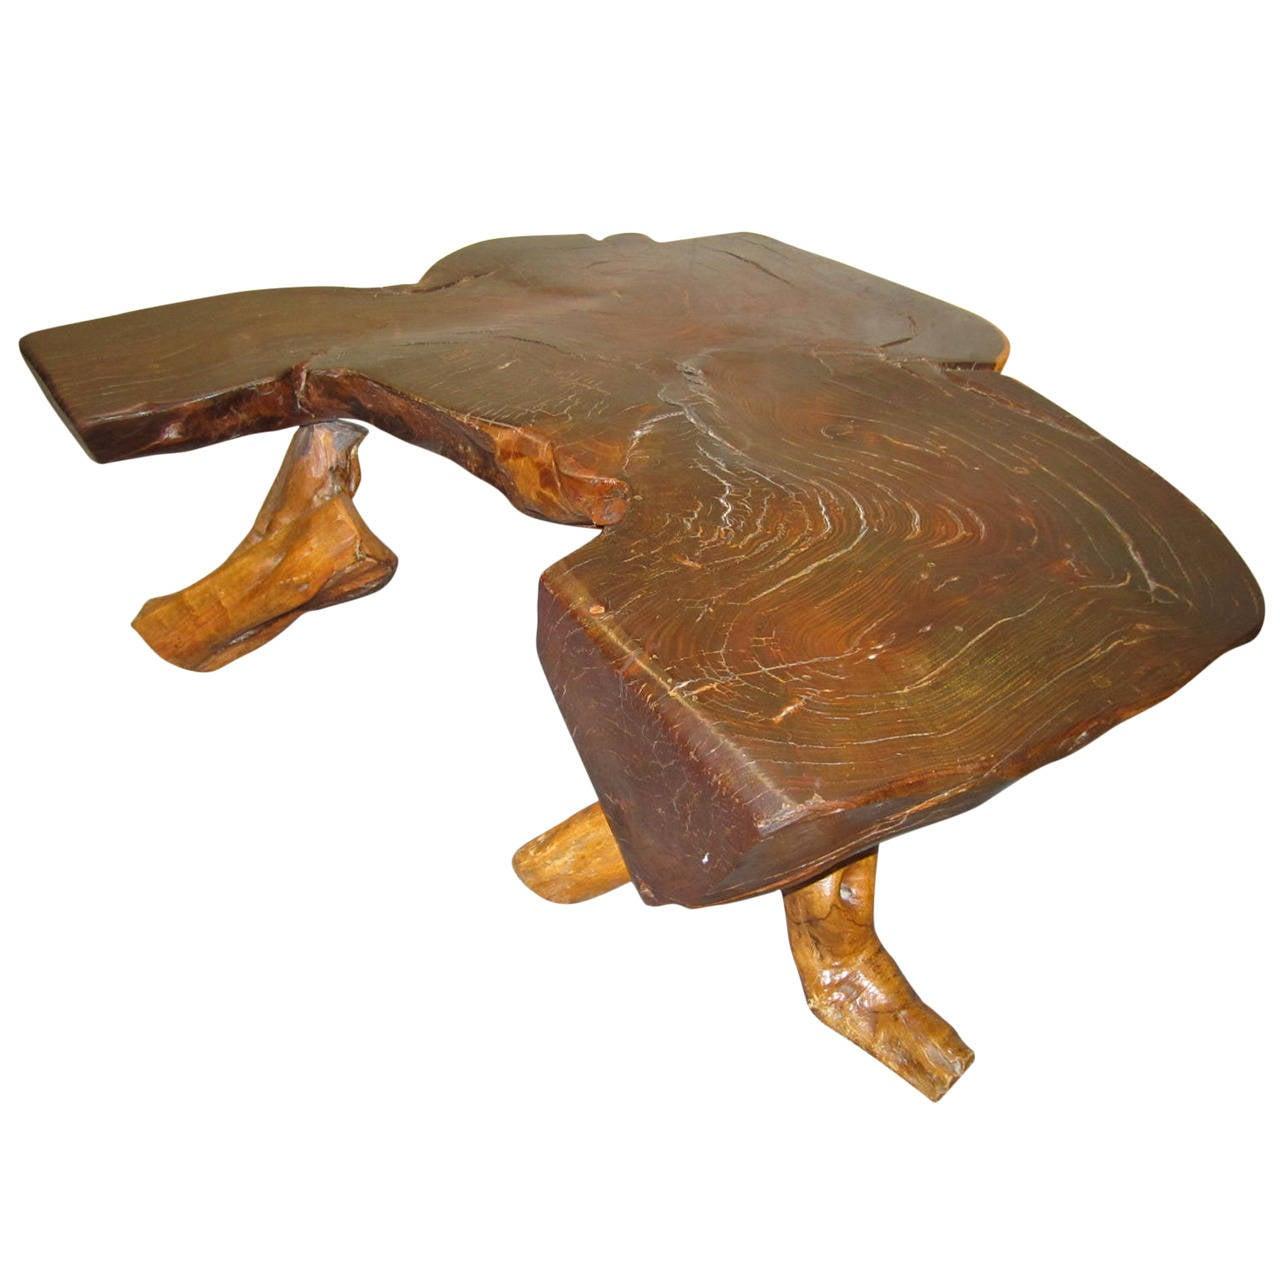 organic redwood free edge coffee table mid century modern at 1stdibs. Black Bedroom Furniture Sets. Home Design Ideas